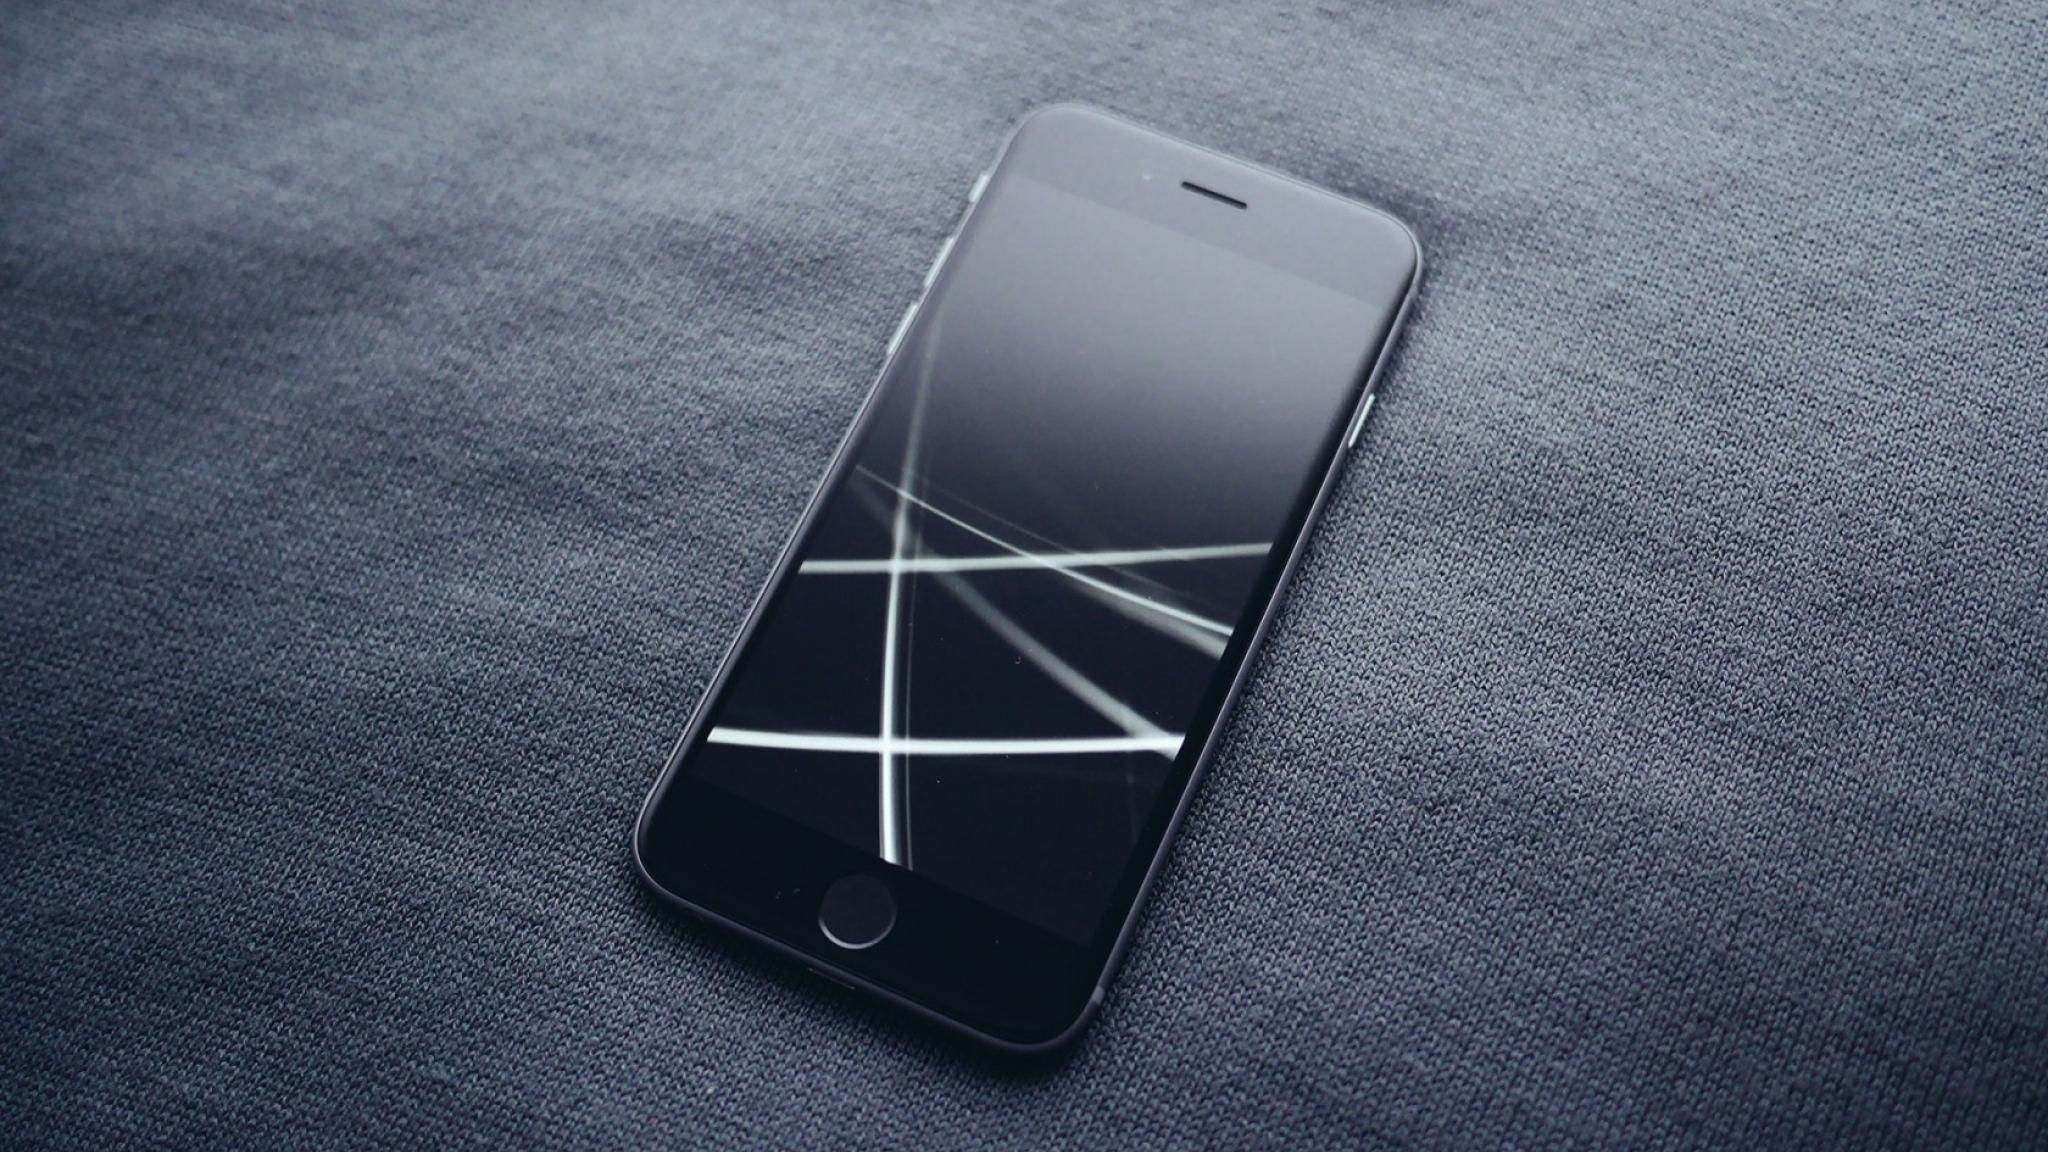 2048x1152 Iphone 6 Iphone Apple 2048x1152 Resolution